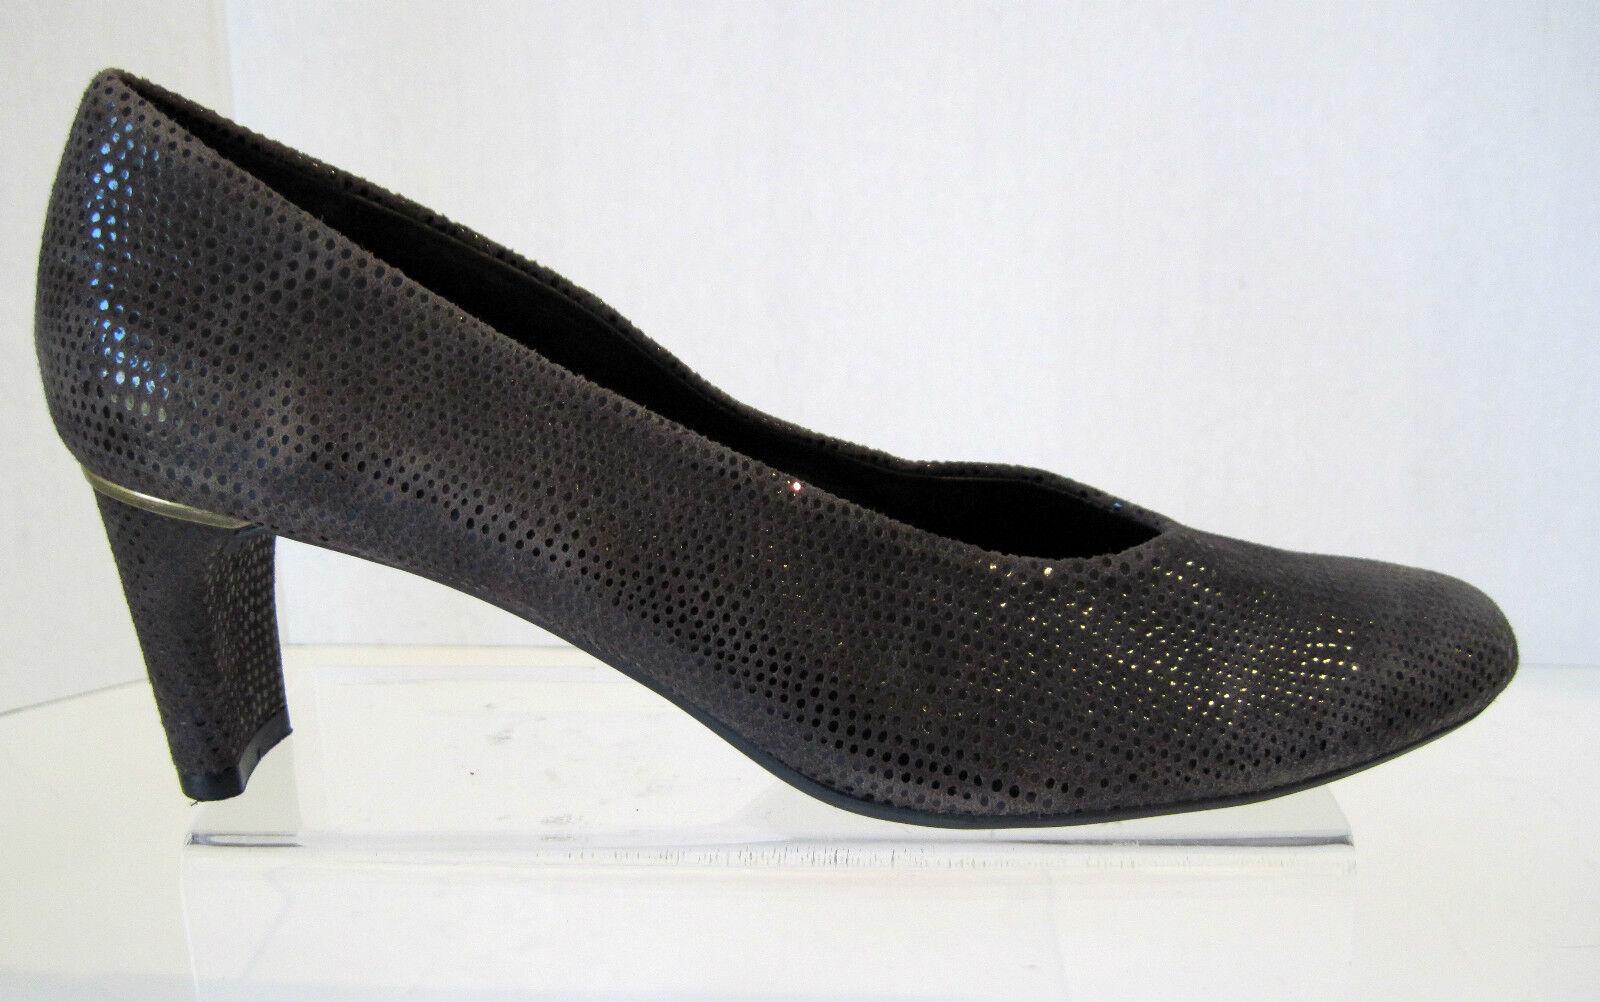 Womens Van Eli  Brown suede pumps/ shoes Reptile Print  Size. 9.5 N, NEW